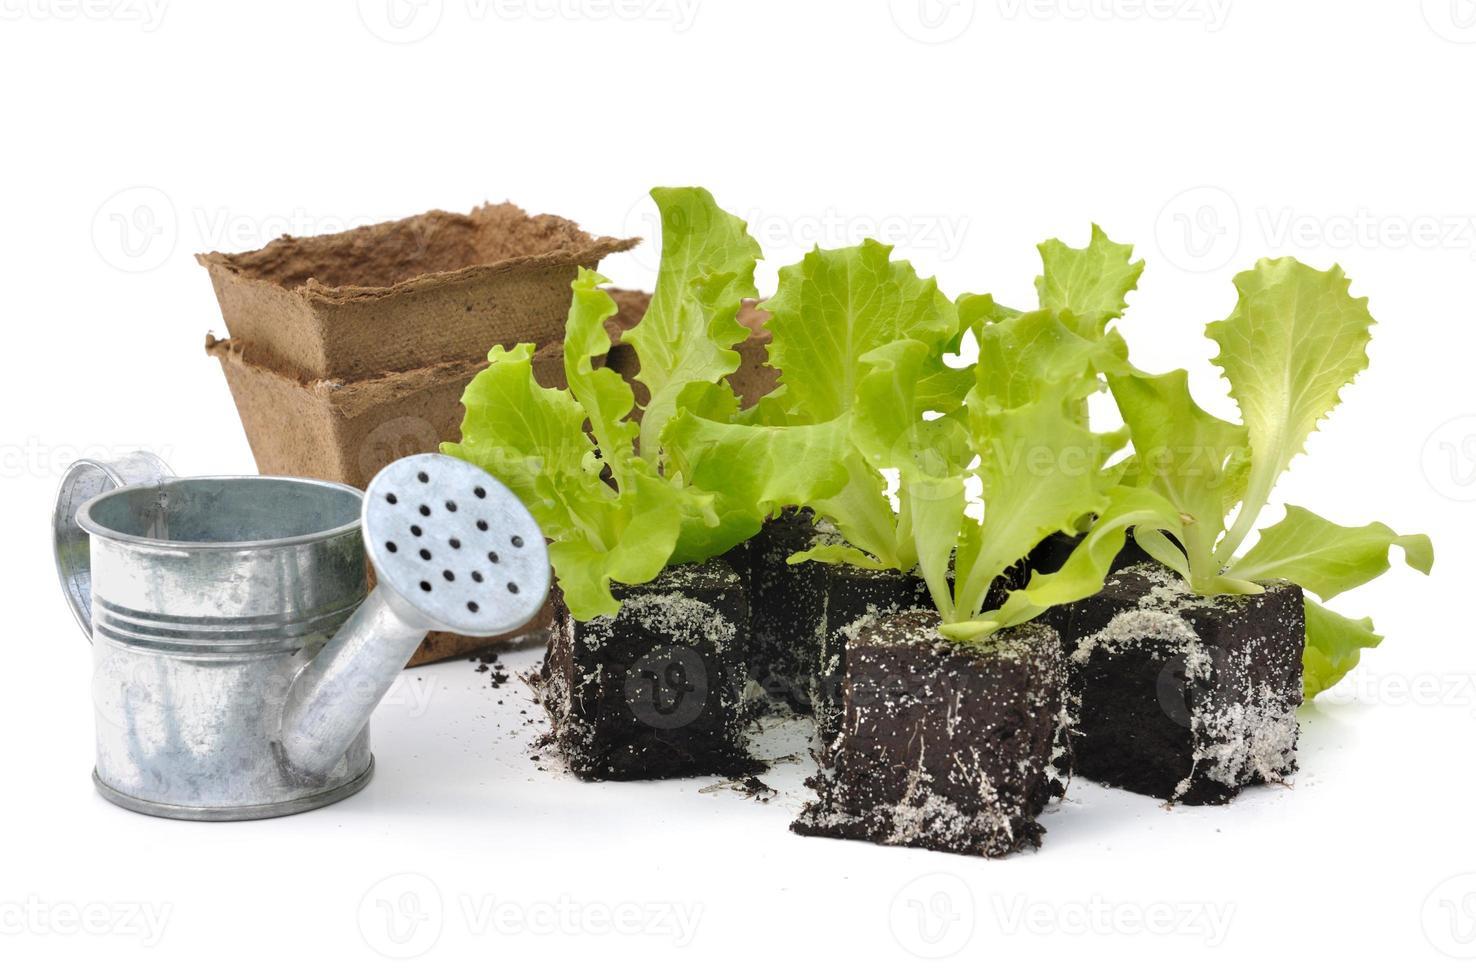 salade schiet foto